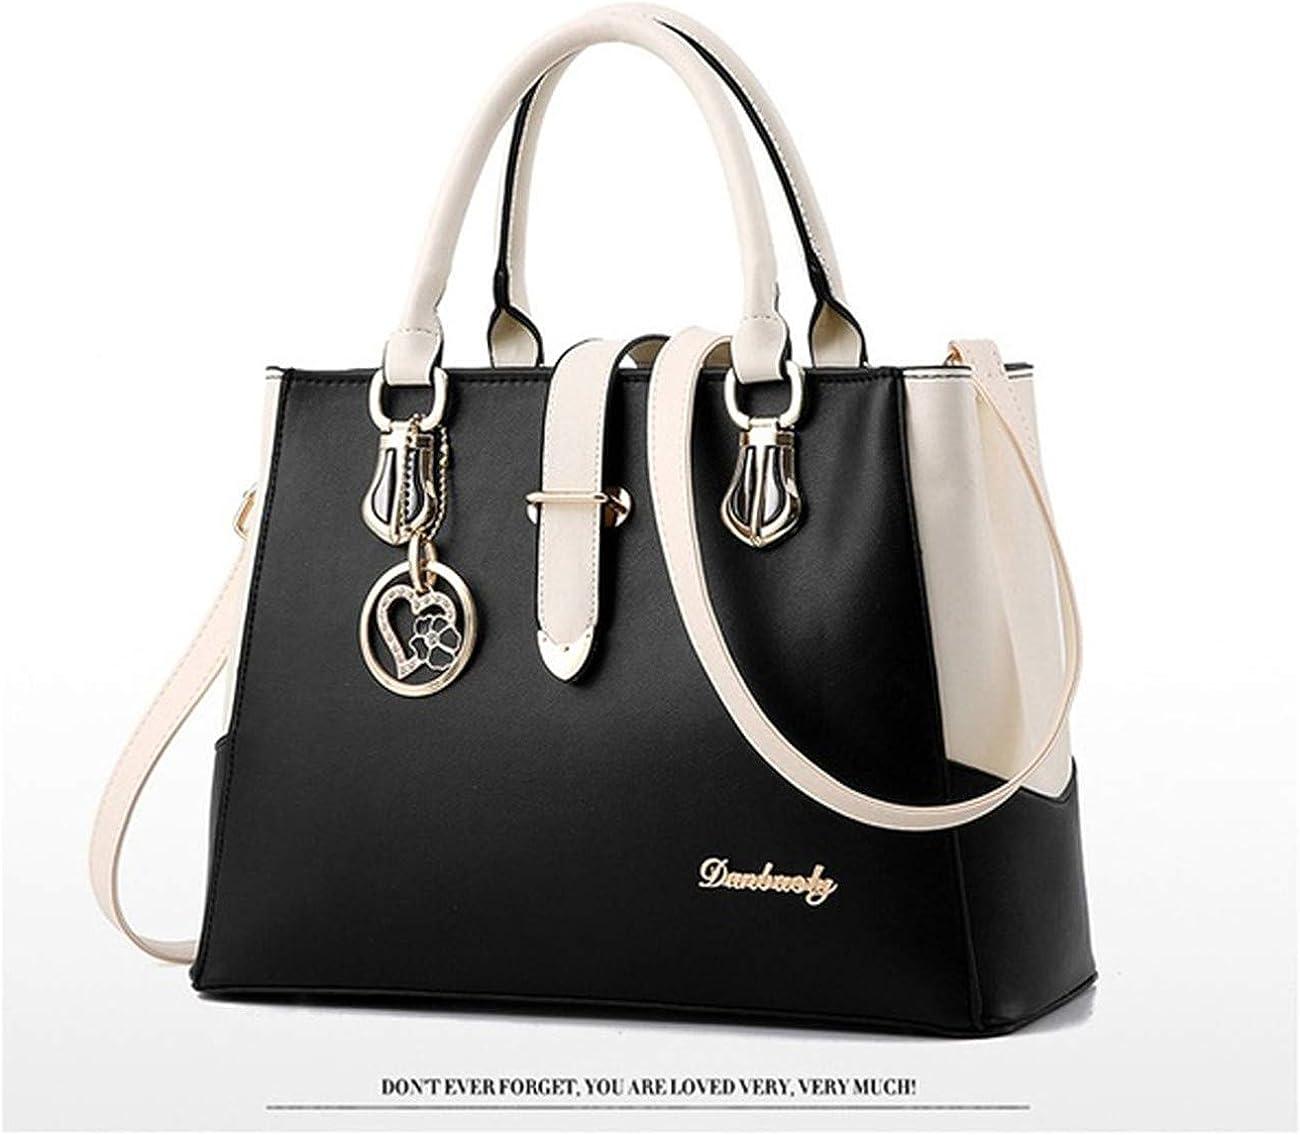 Bigsweety Womens Tote Handbag PU Leather Shoulder Bag Tassel Pendant Purse Messenger Crossbody Bag